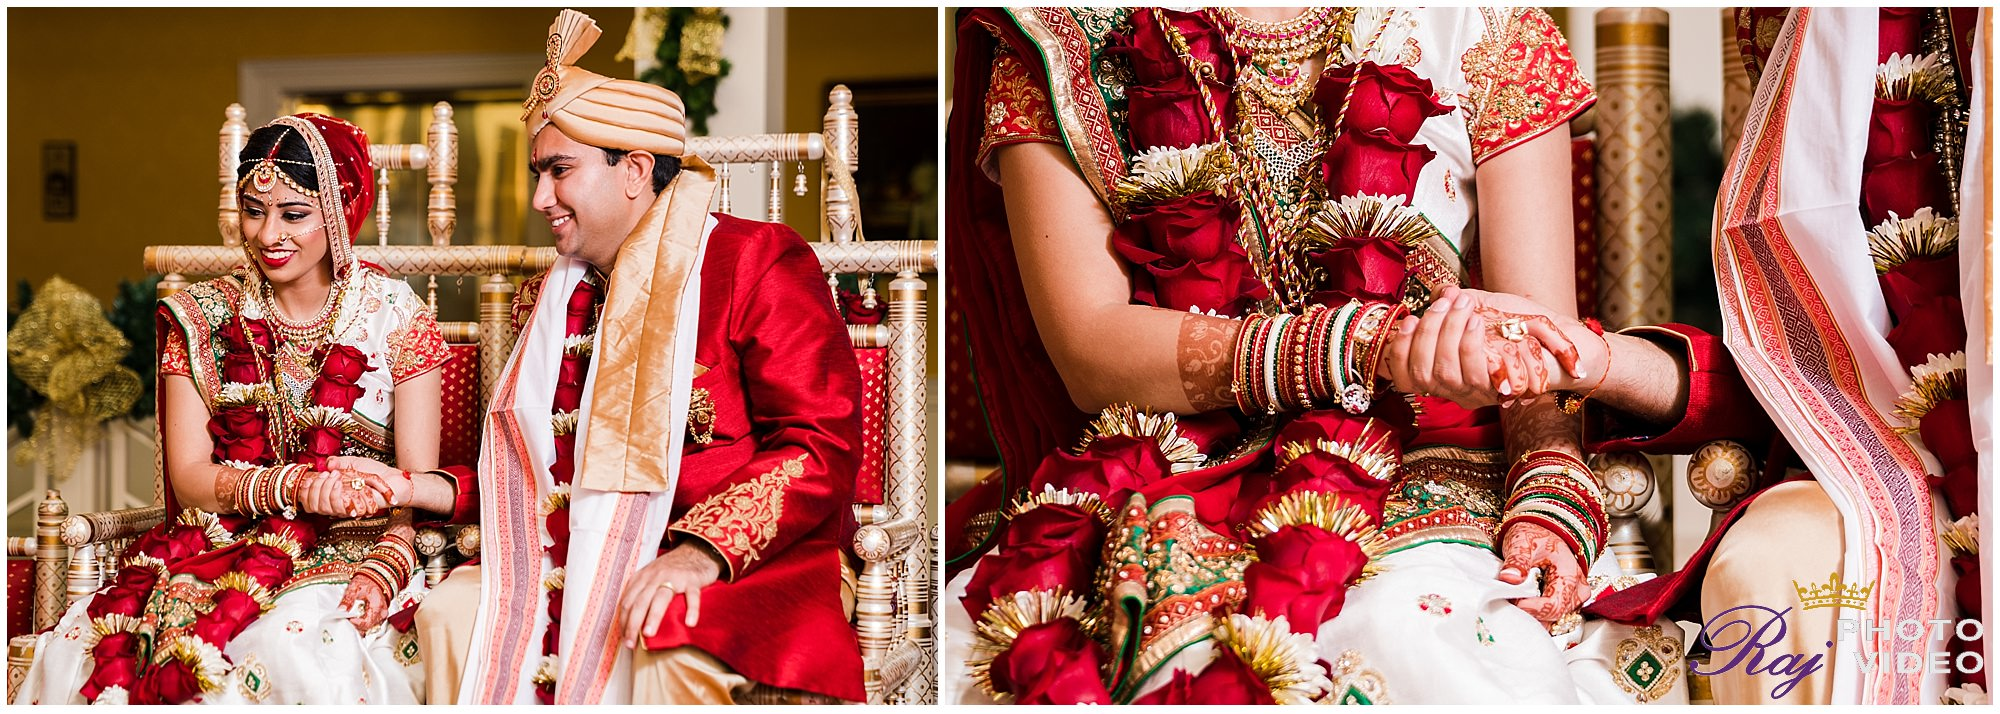 Founders-Inn-and-Spa-Virginia-Beach-VA-Indian-Wedding-Harini-Vivek-47.jpg